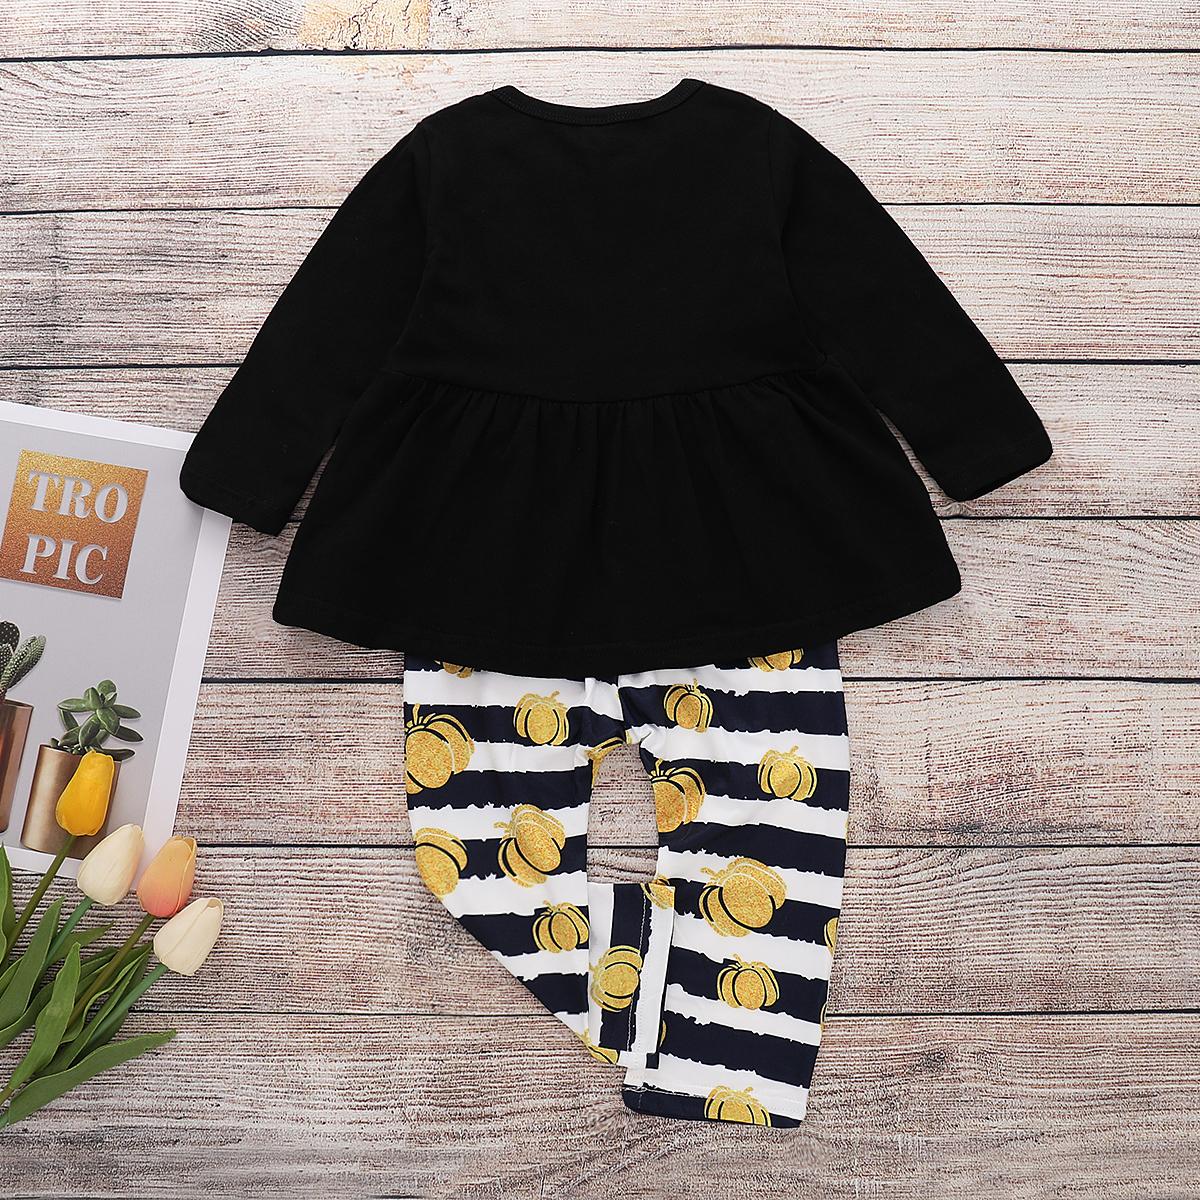 Asian size 2PCS Suit 2018 Autumn Baby New Cotton Halloween Pumpkin Print  Clothes Sets Girls Long Sleeve Costume